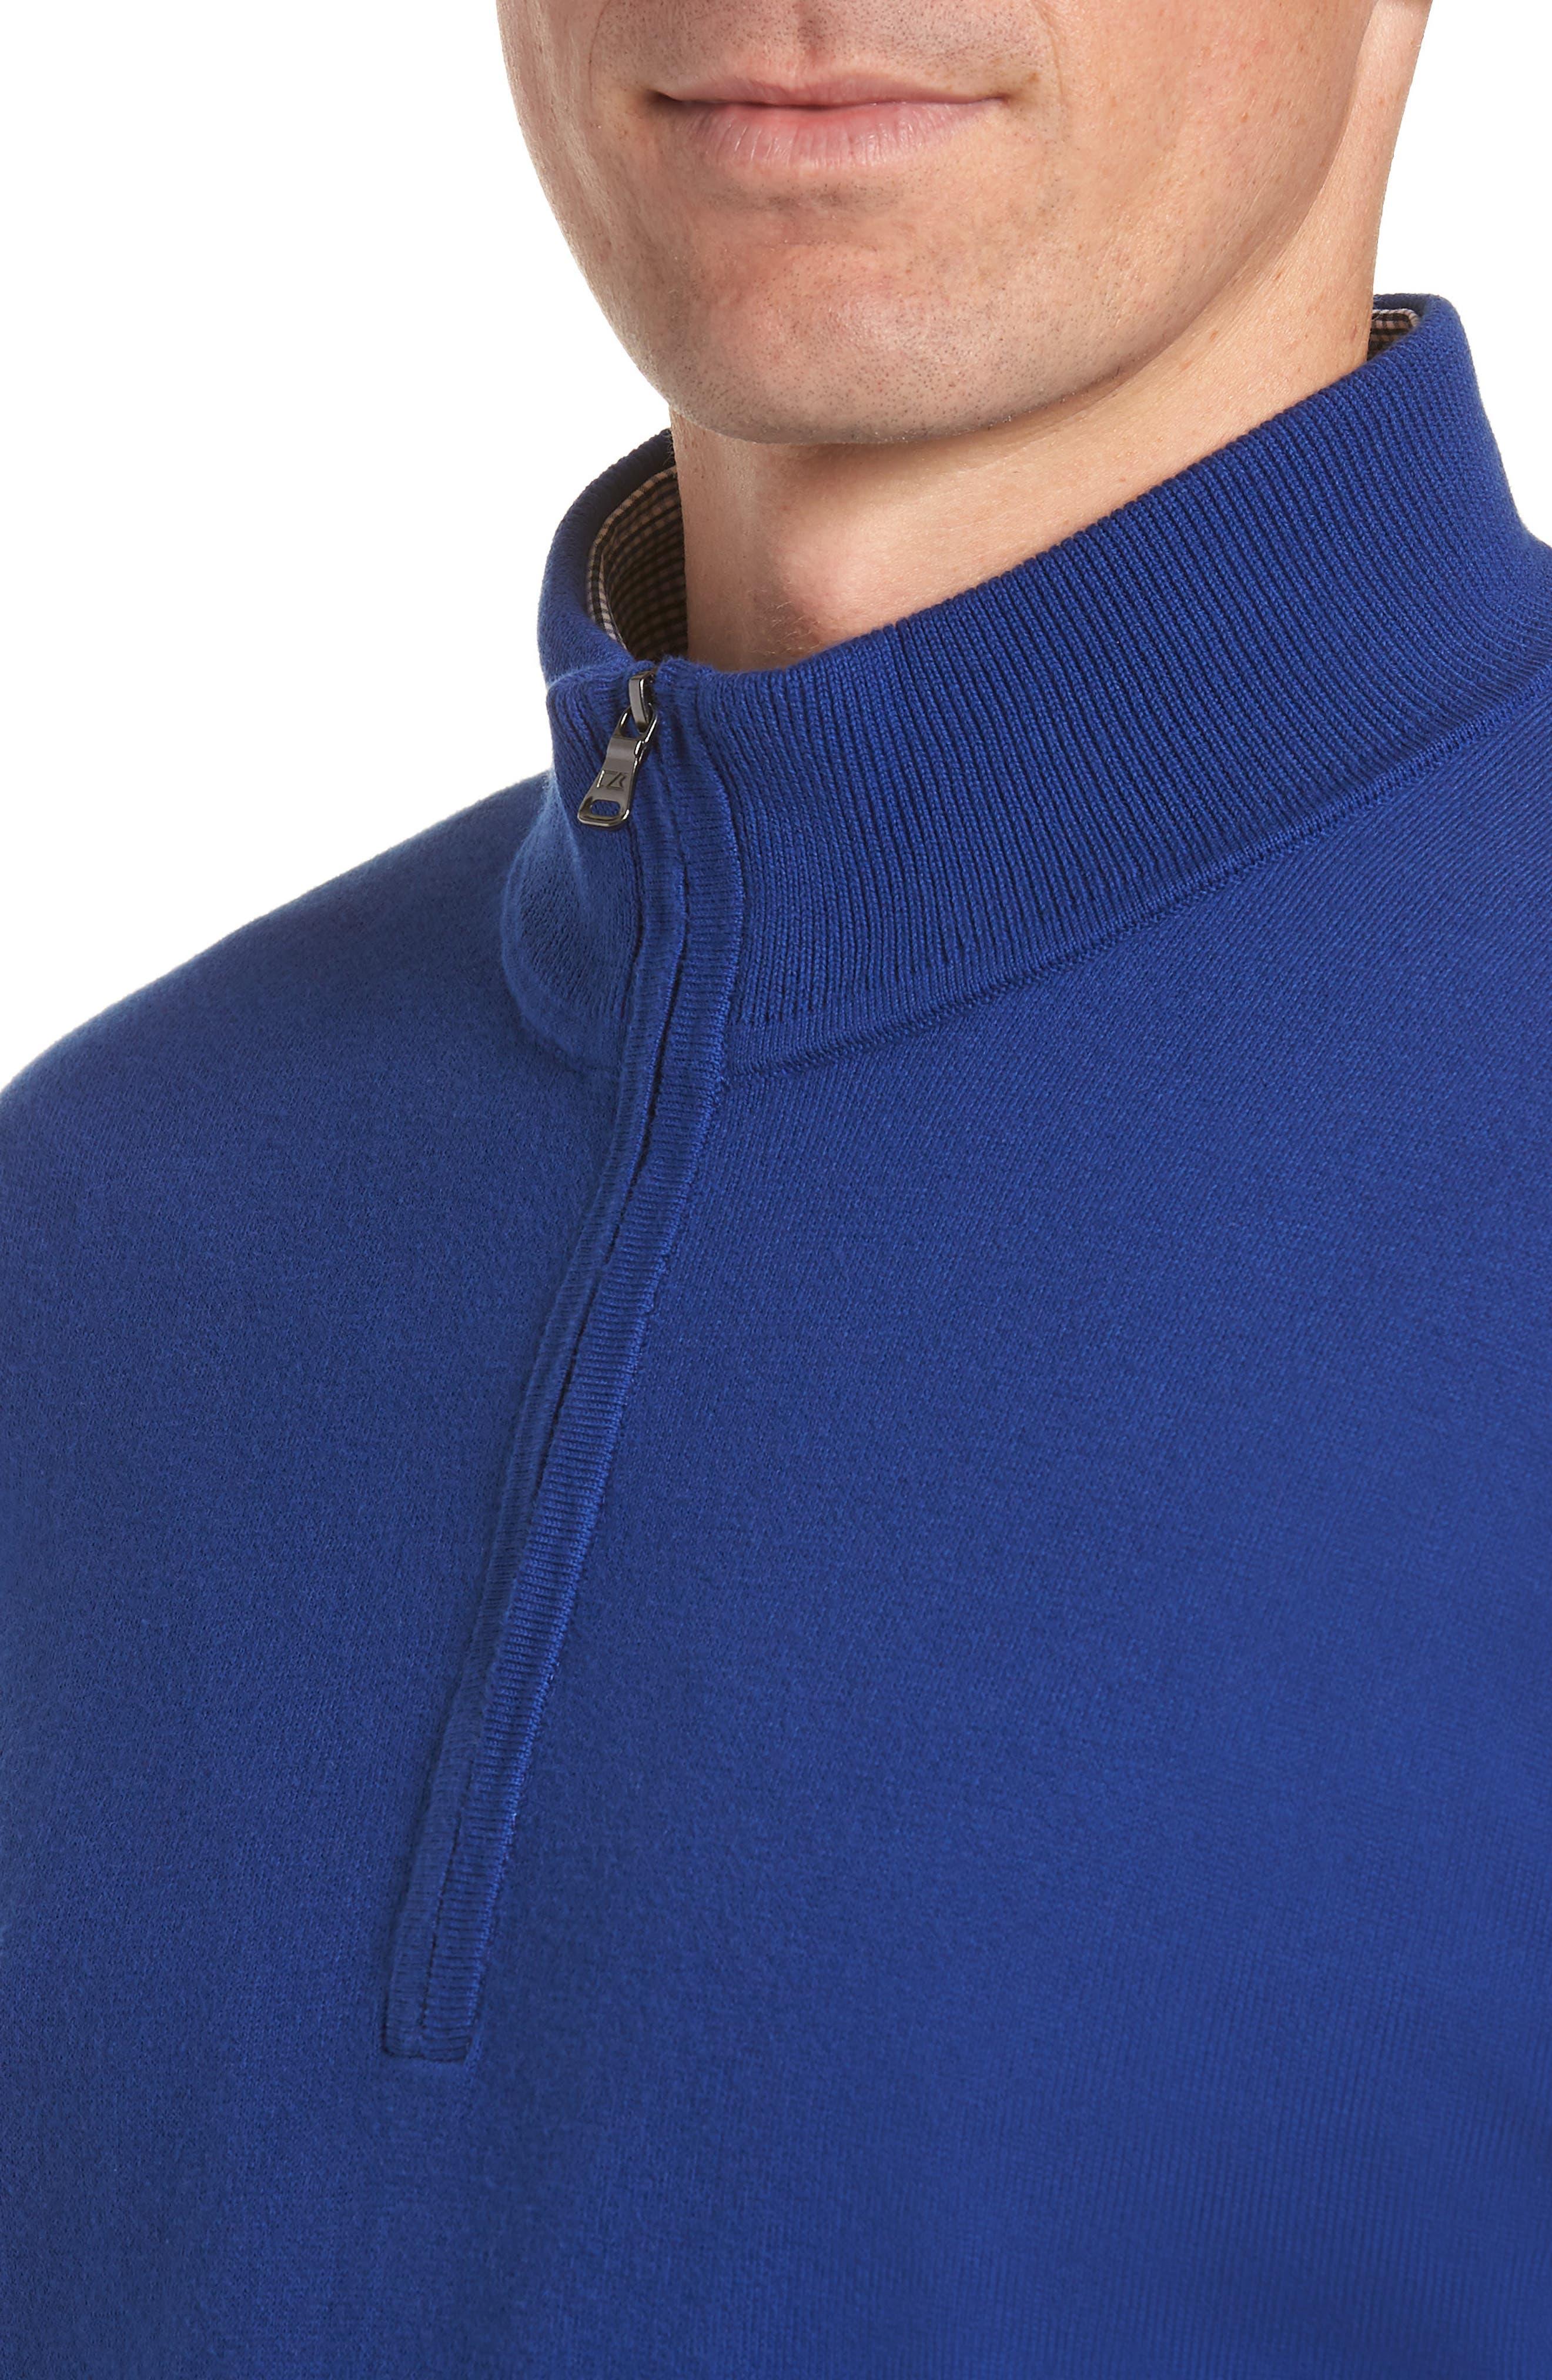 CUTTER & BUCK, Lakemont Half Zip Sweater, Alternate thumbnail 4, color, 419